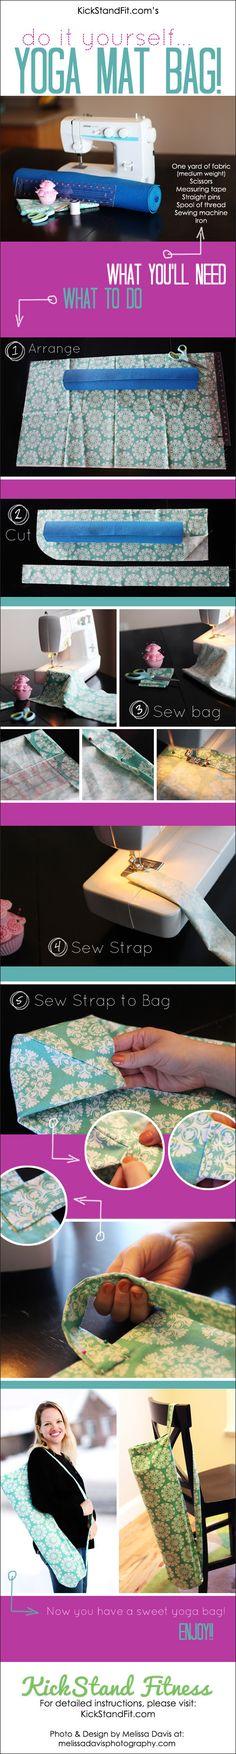 How to Make a Yoga Mat Bag. Simple photo tutorial. #yoga